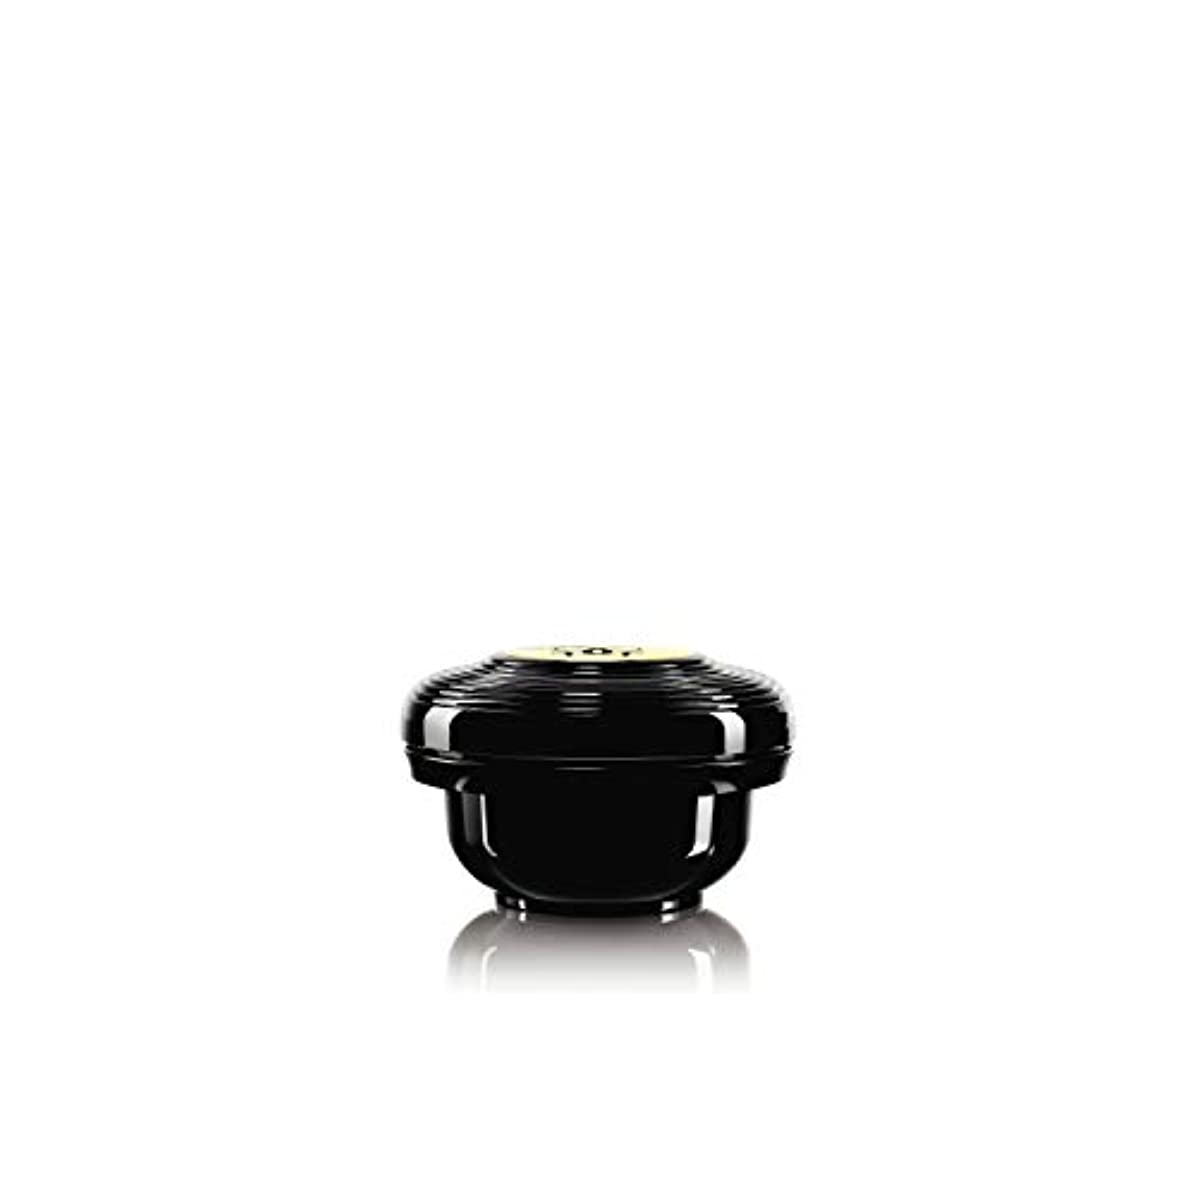 【GUERLAIN(ゲラン)】オーキデ アンペリアル ブラック クリーム ベルナルド(リフィル)50mL/クリーム